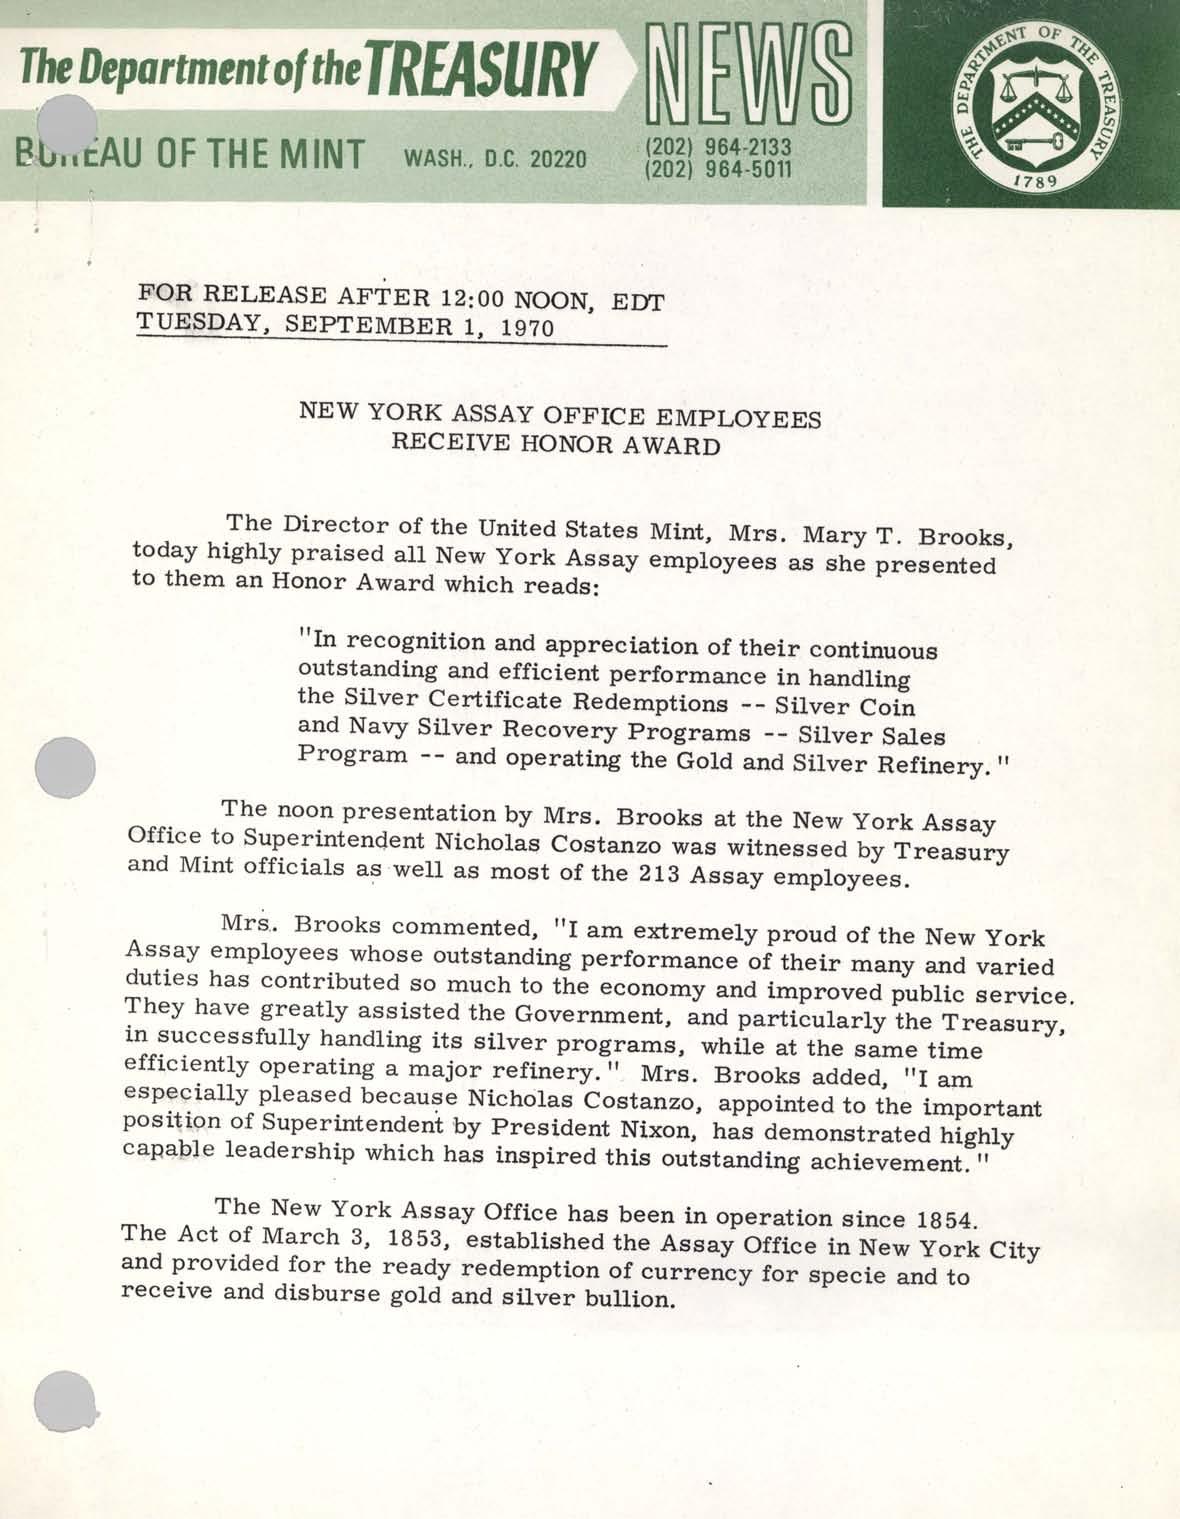 Historic Press Release: NY Assay Office Award, Page 1